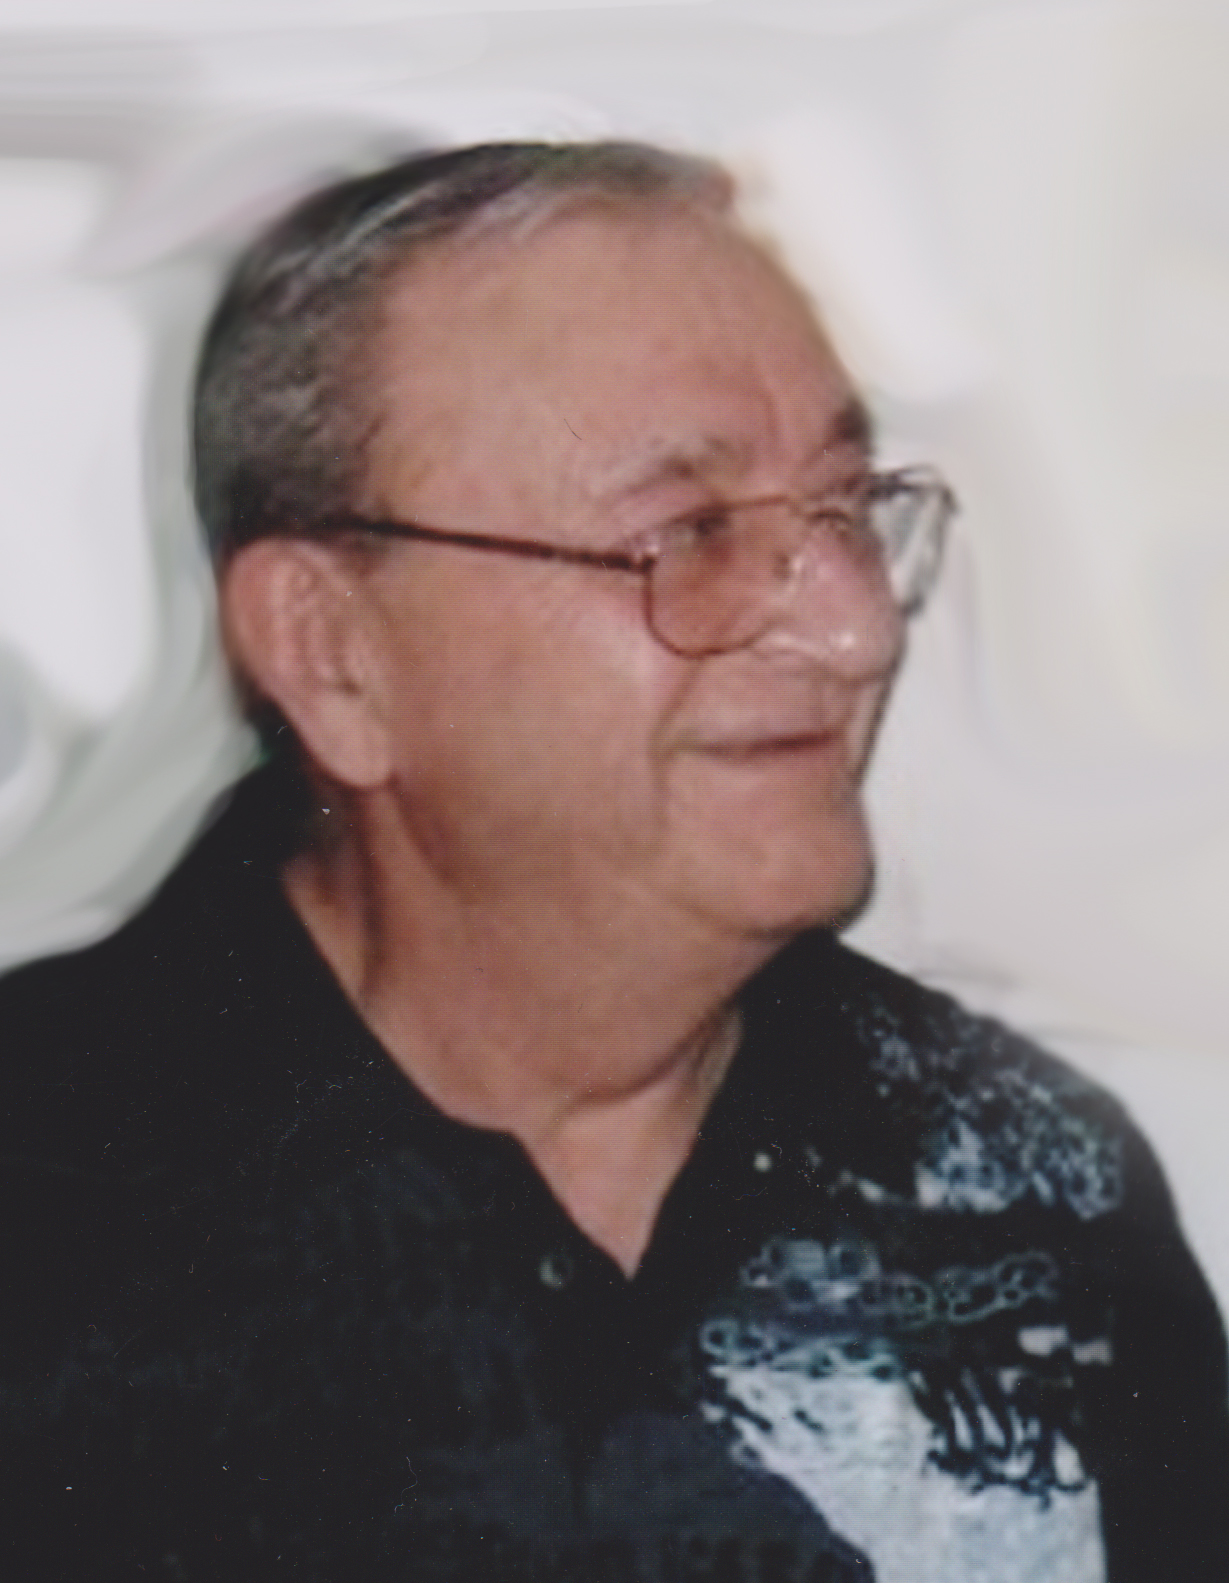 Jean-Damien Chouinard